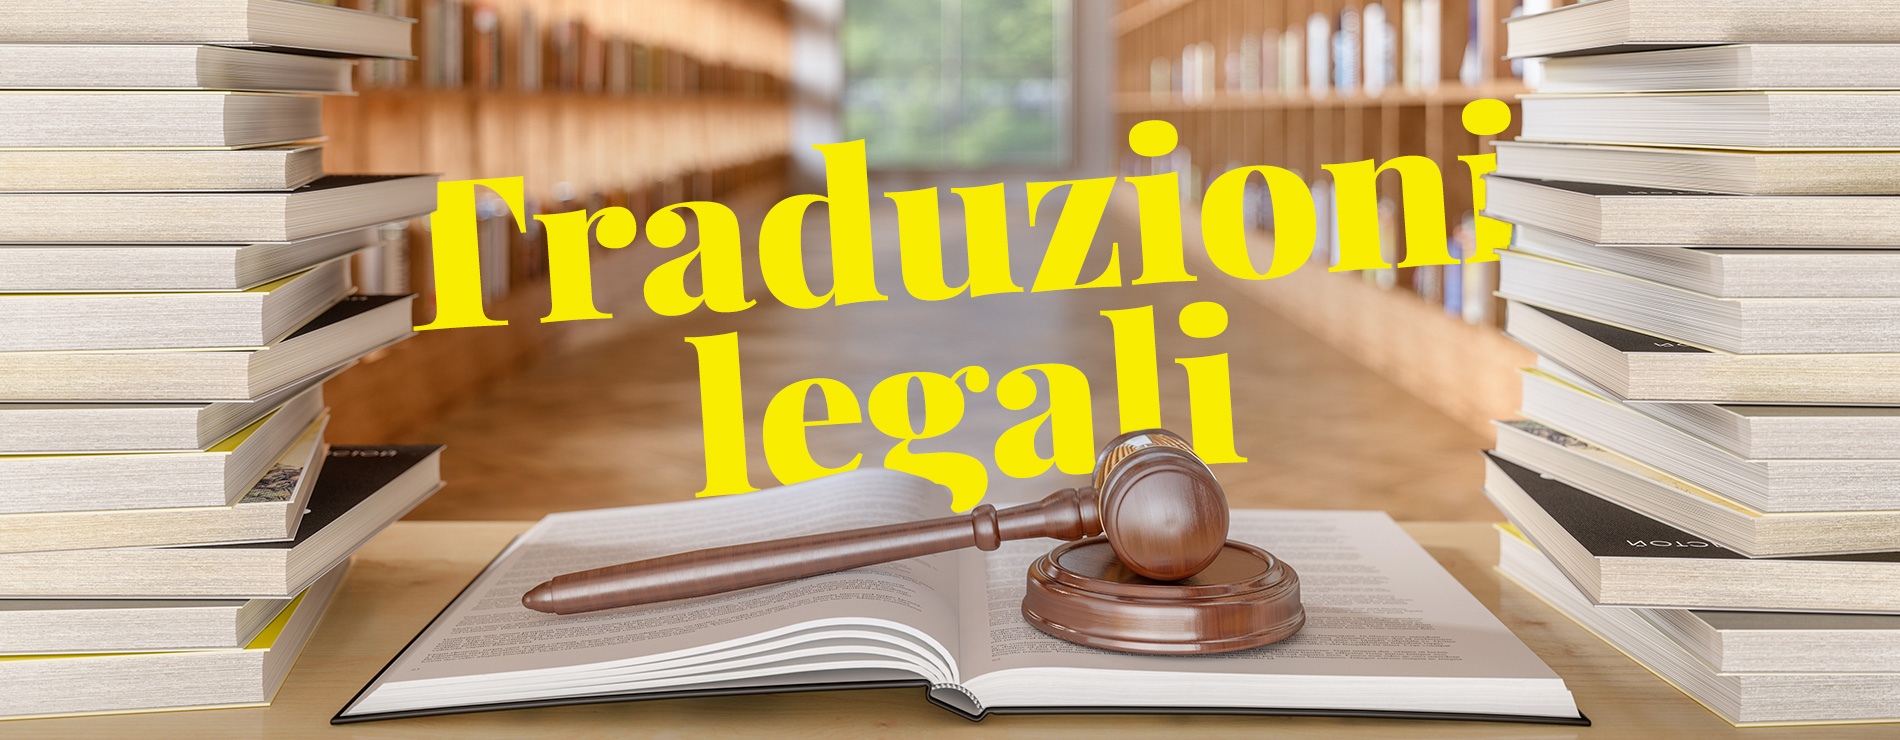 traduzioni legali header